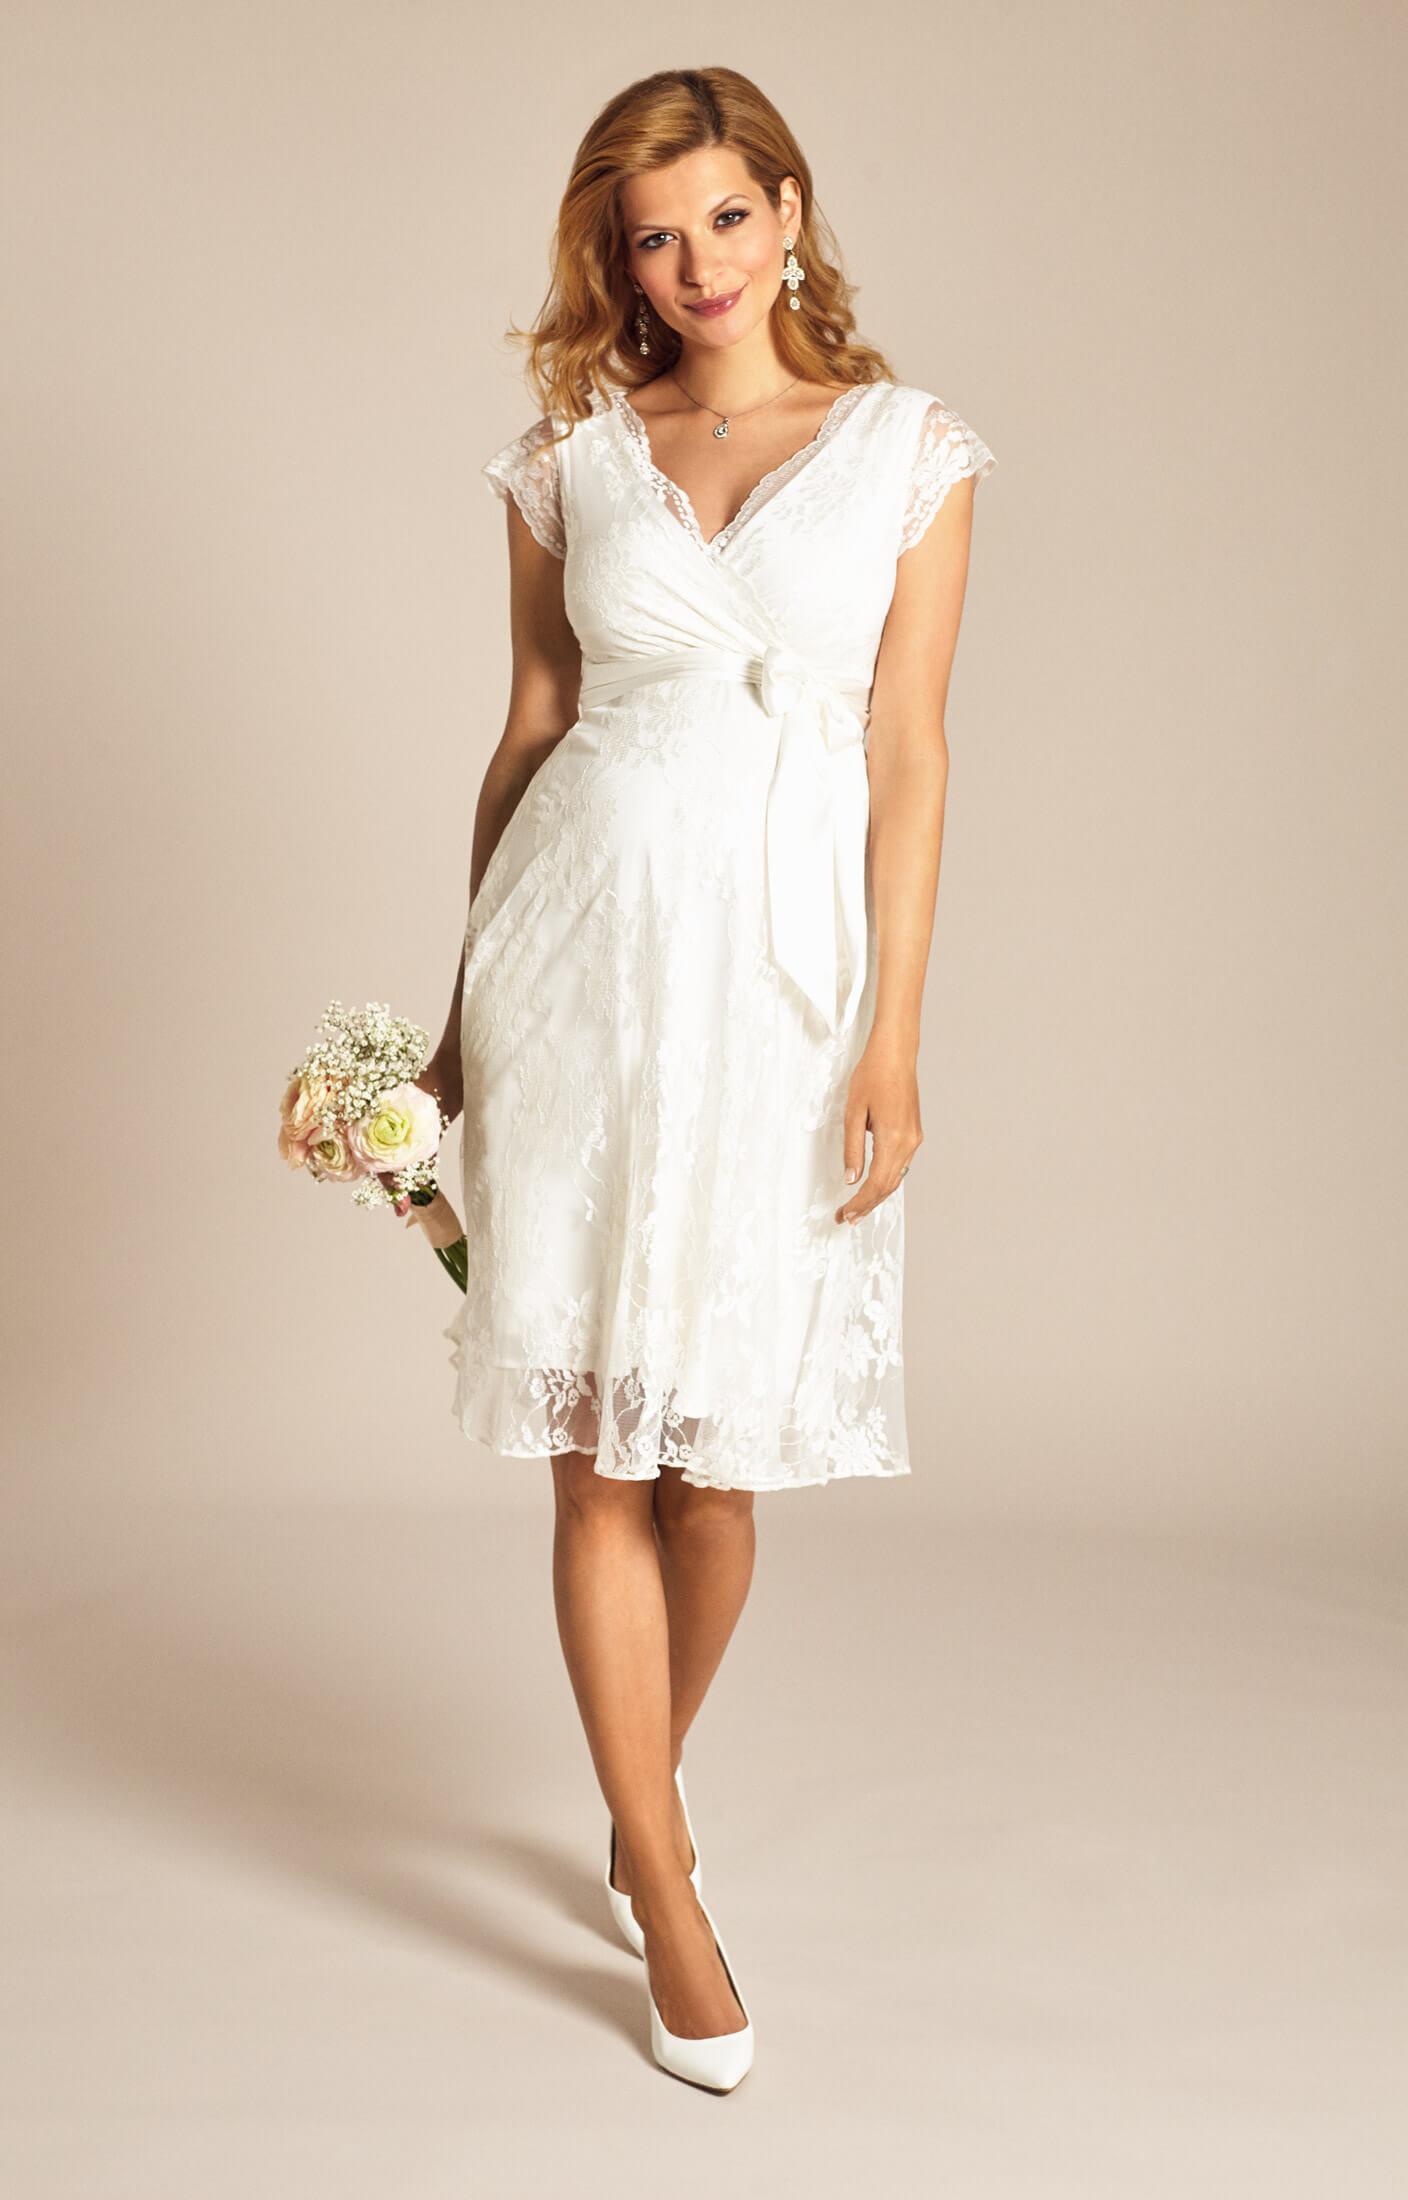 02c7fa03bbf1a6 Eden Maternity Wedding Dress Ivory Dream) - Maternity Wedding Dresses,  Evening Wear and Party Clothes by Tiffany Rose UK